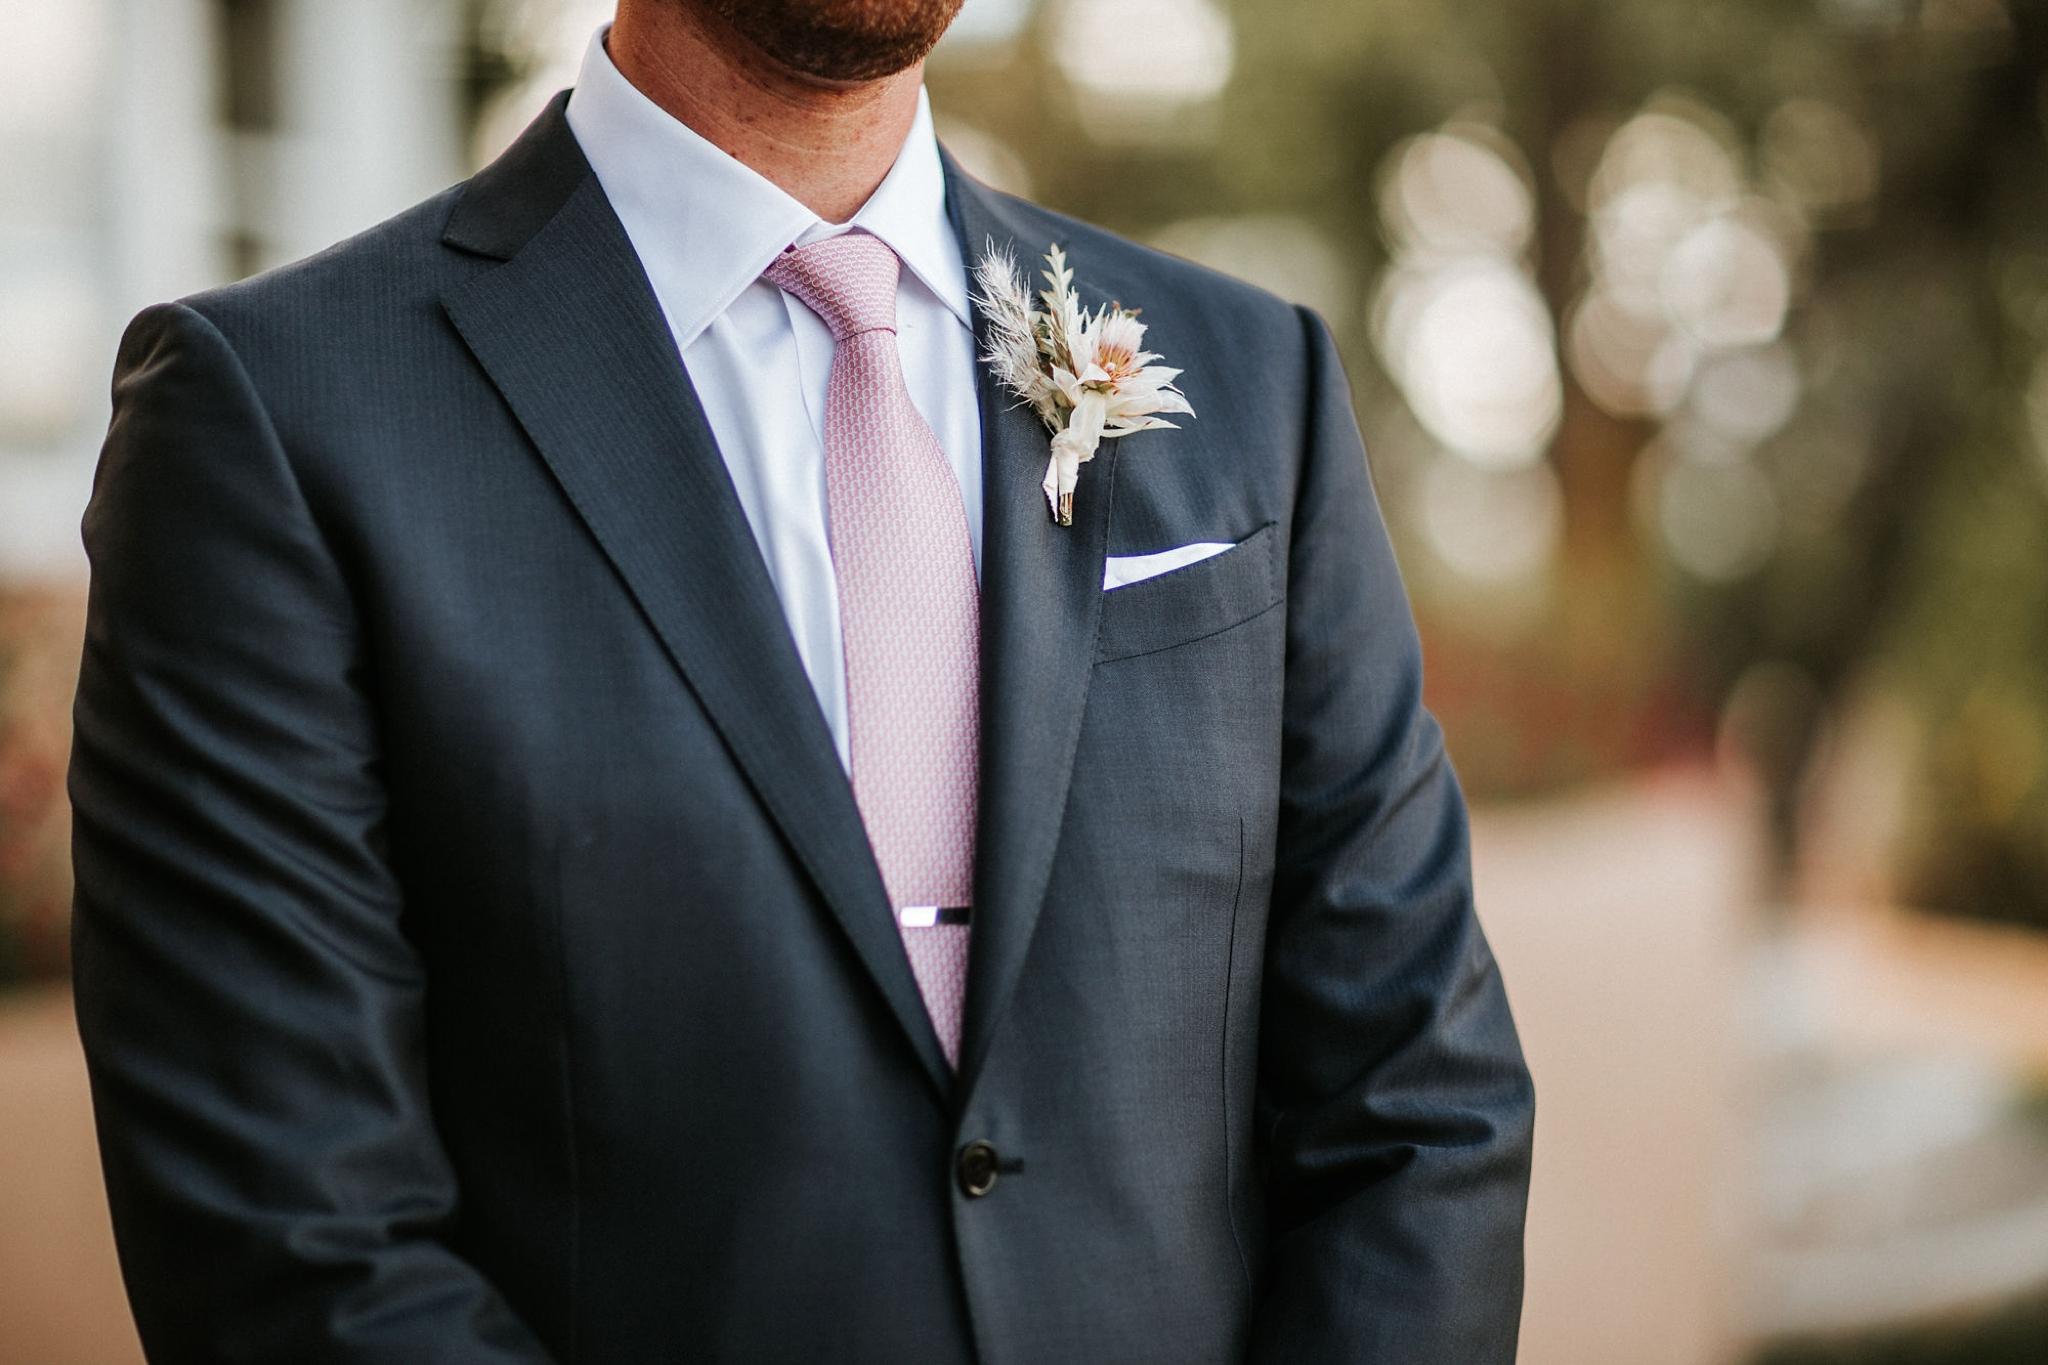 Alicia+lucia+photography+-+albuquerque+wedding+photographer+-+santa+fe+wedding+photography+-+new+mexico+wedding+photographer+-+new+mexico+wedding+-+wedding+-+groom+-+groom+style+-+wedding+style_0031.jpg